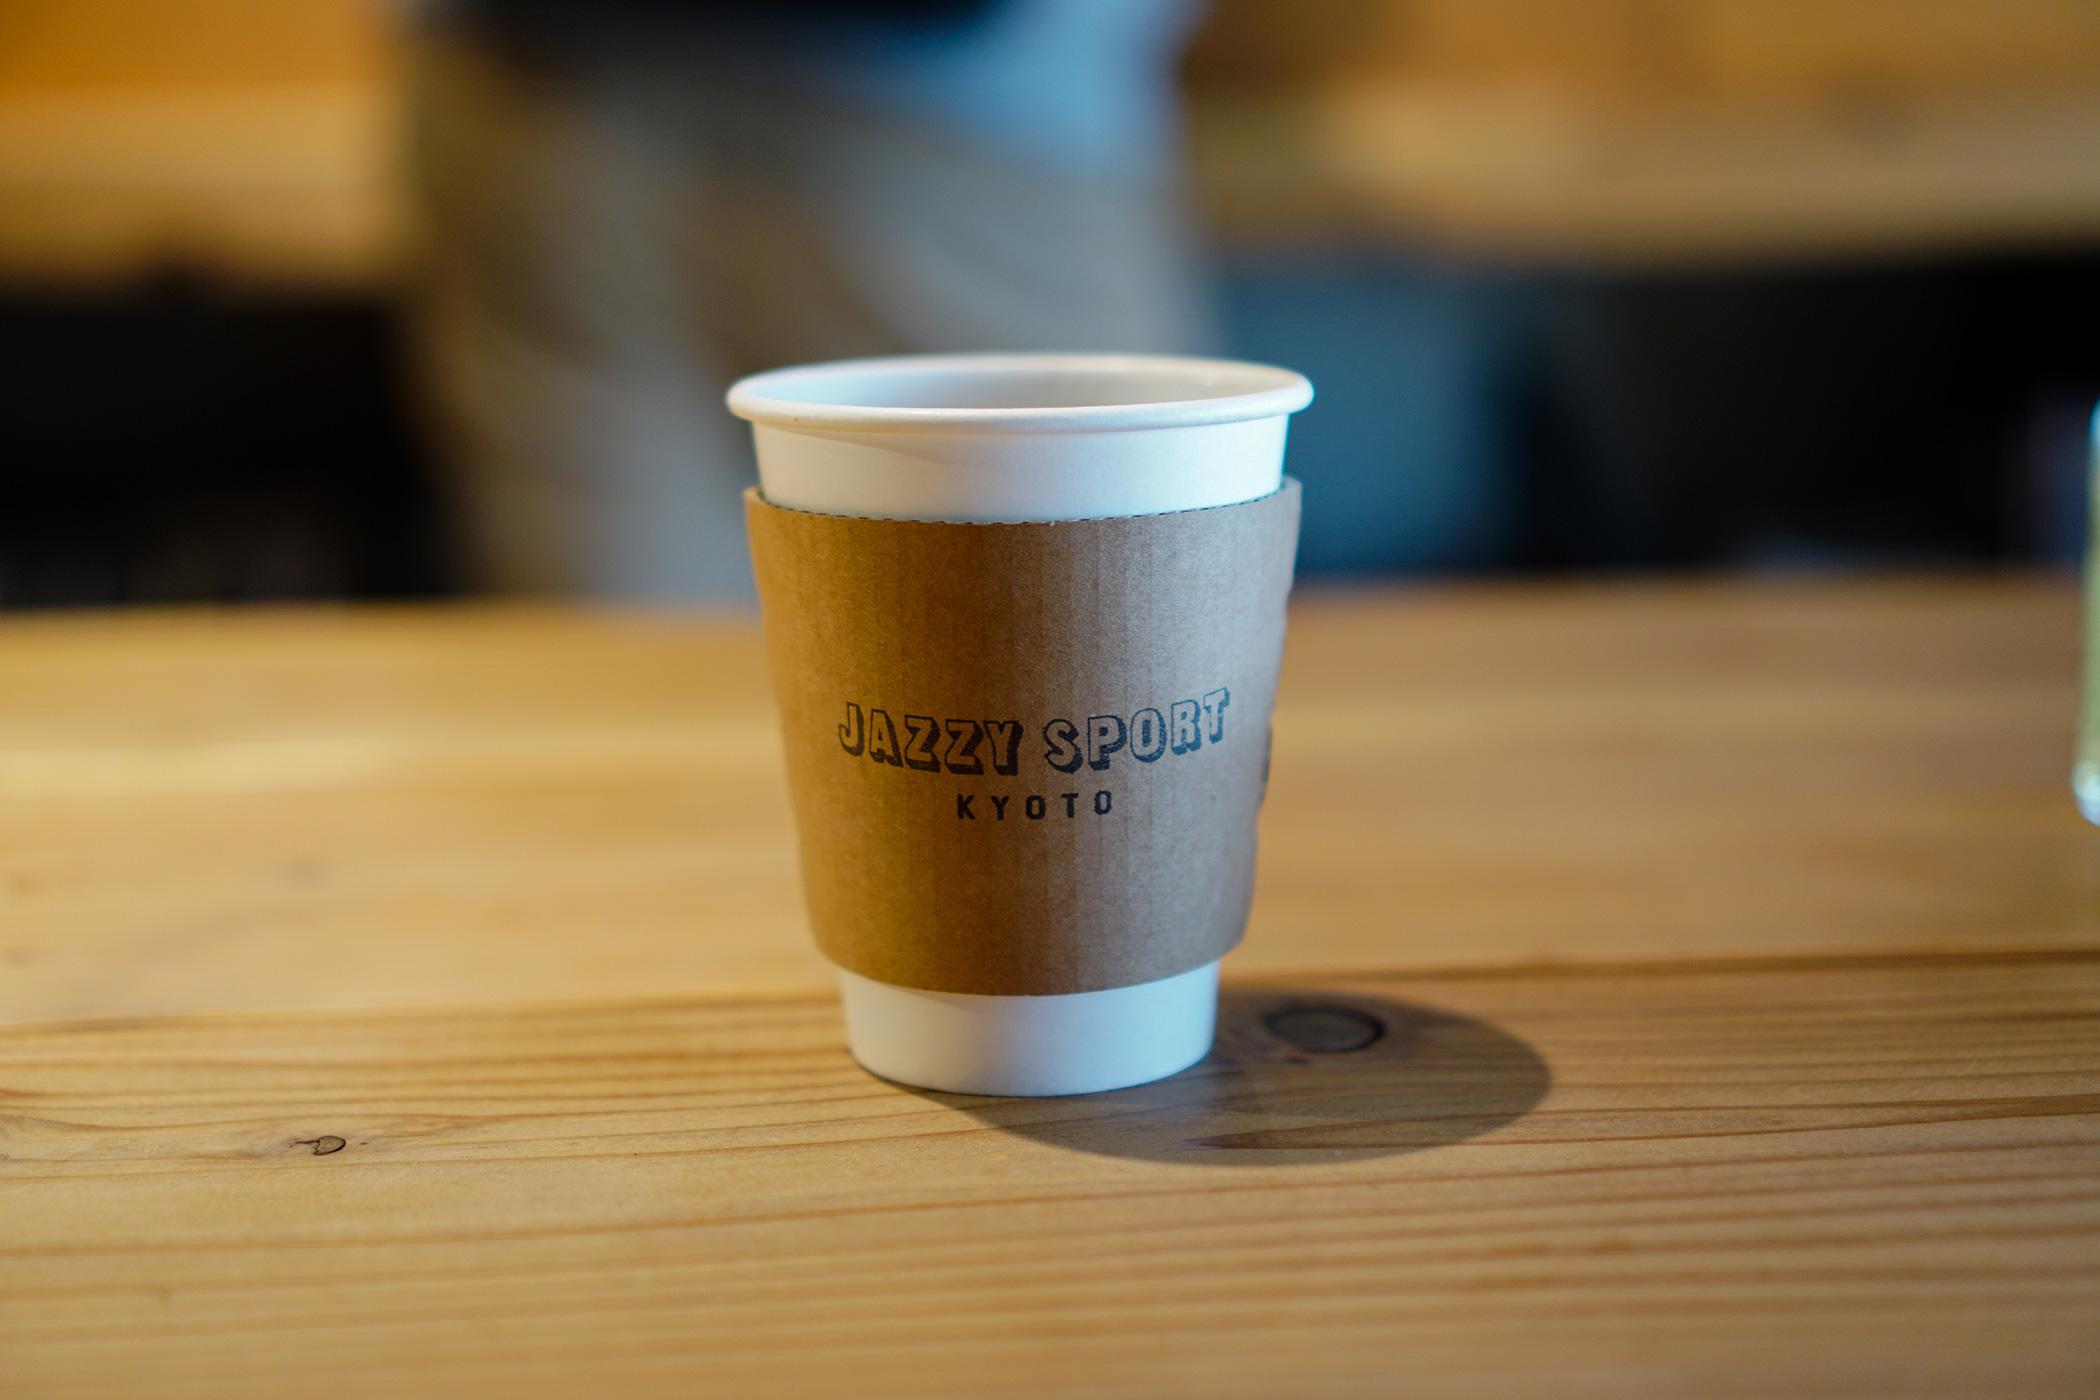 JAZZY SPORT KYOTOのカップ